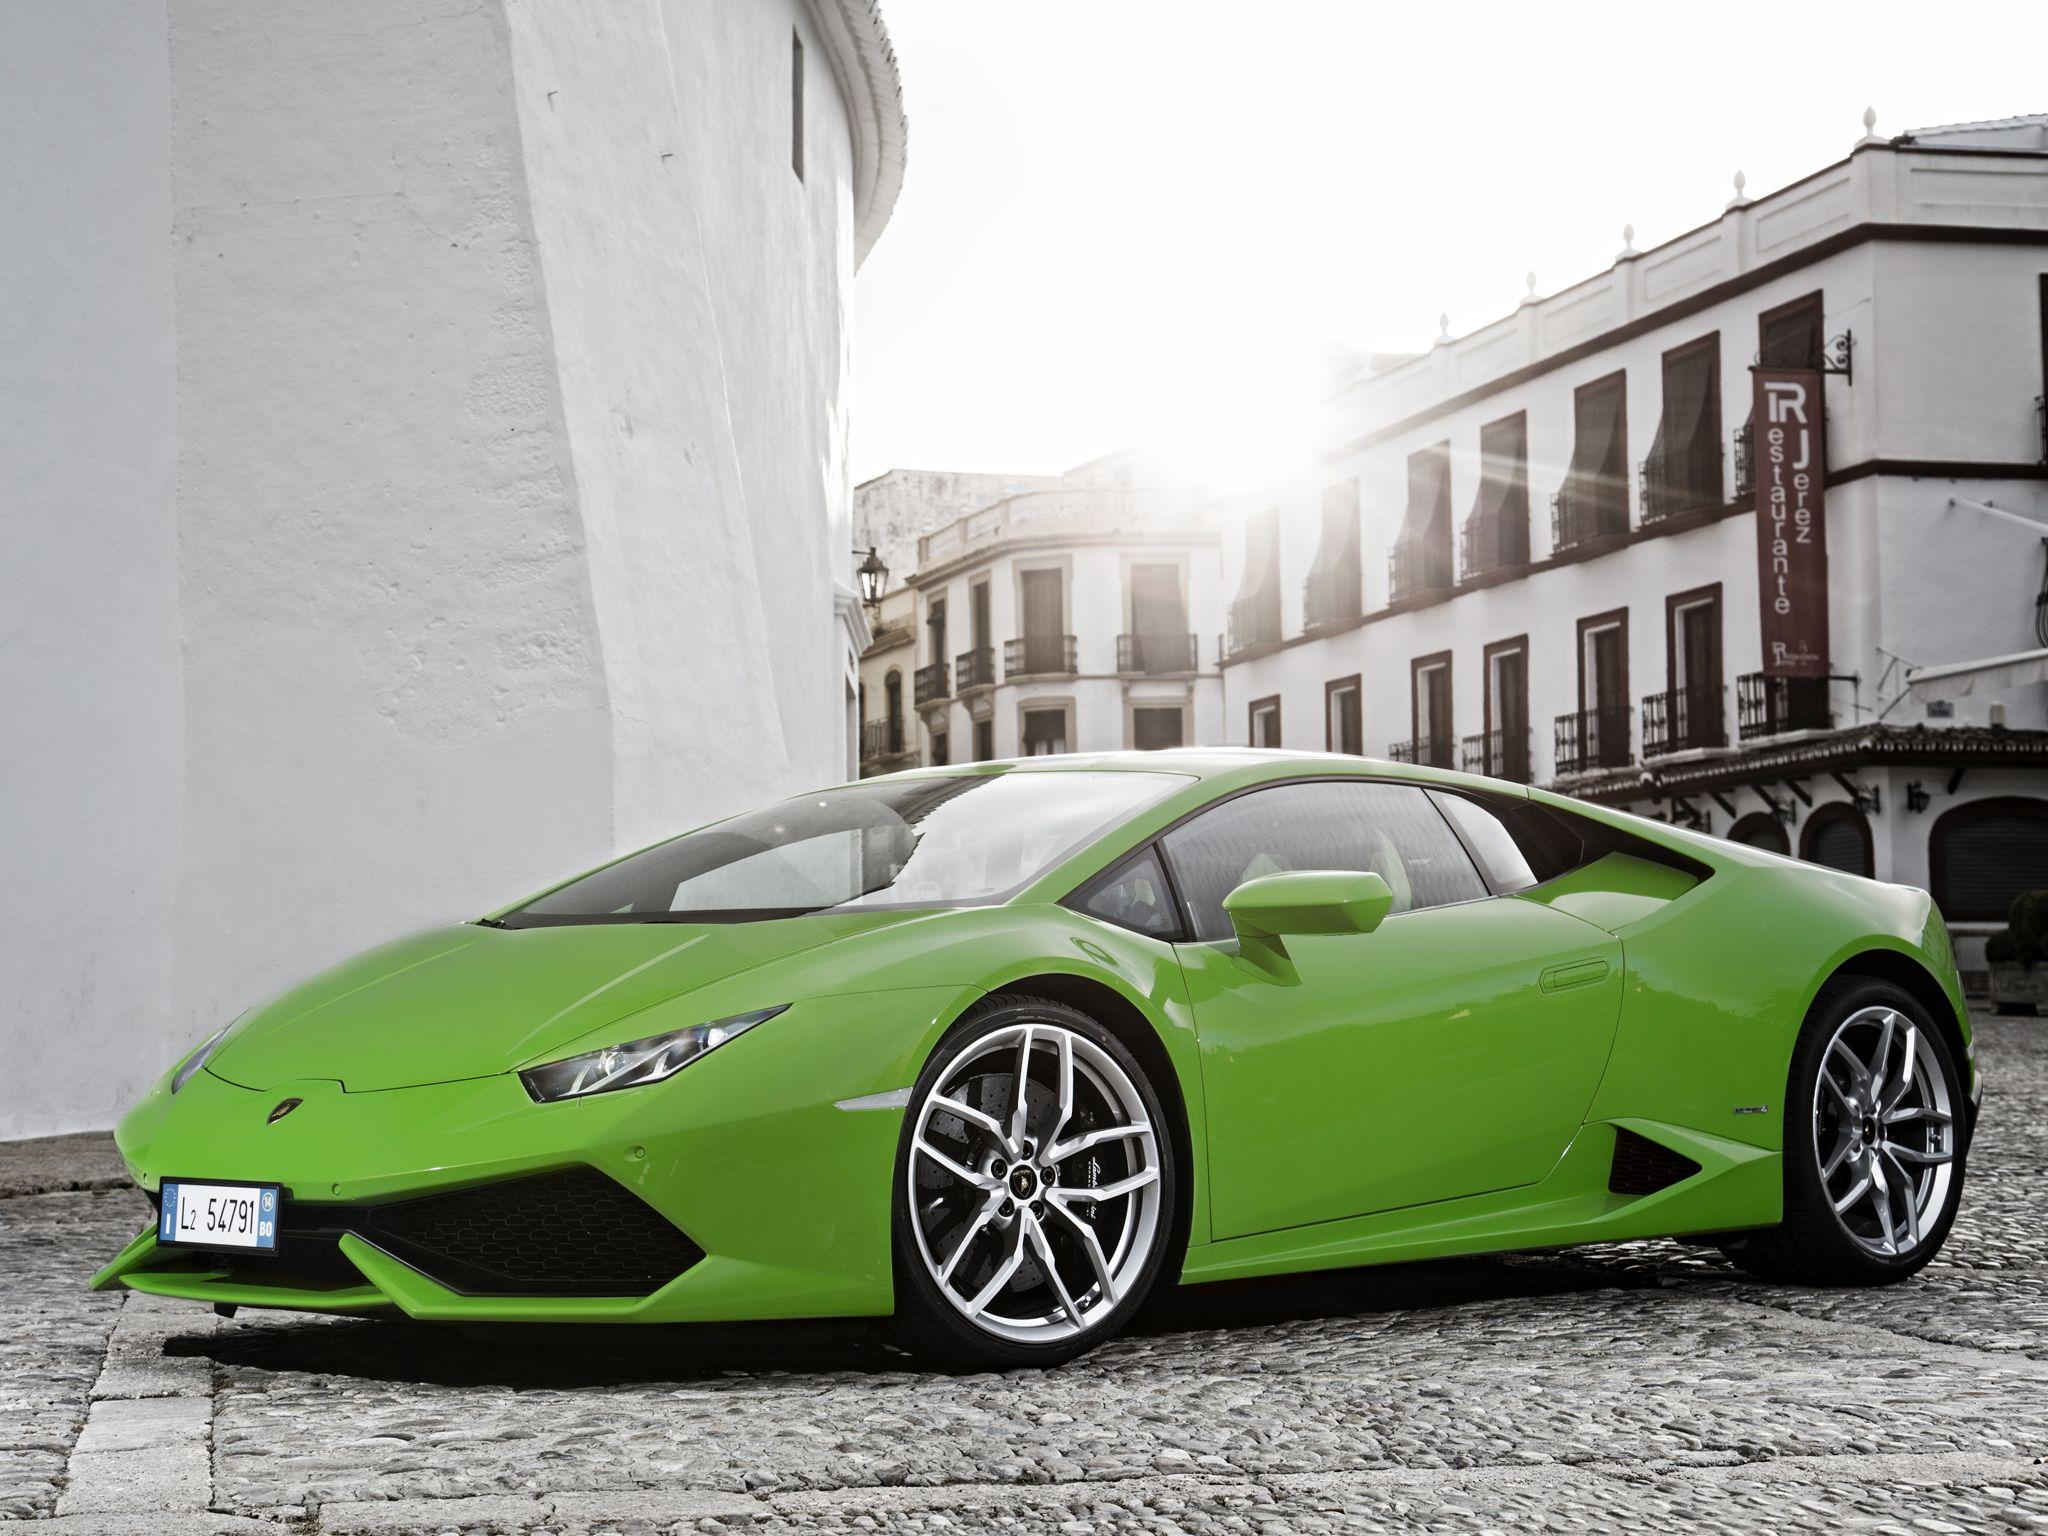 2014 Lamborghini Huracan Lp 610 4 Lamborghini Huracan 2015 Lamborghini Huracan Lamborghini